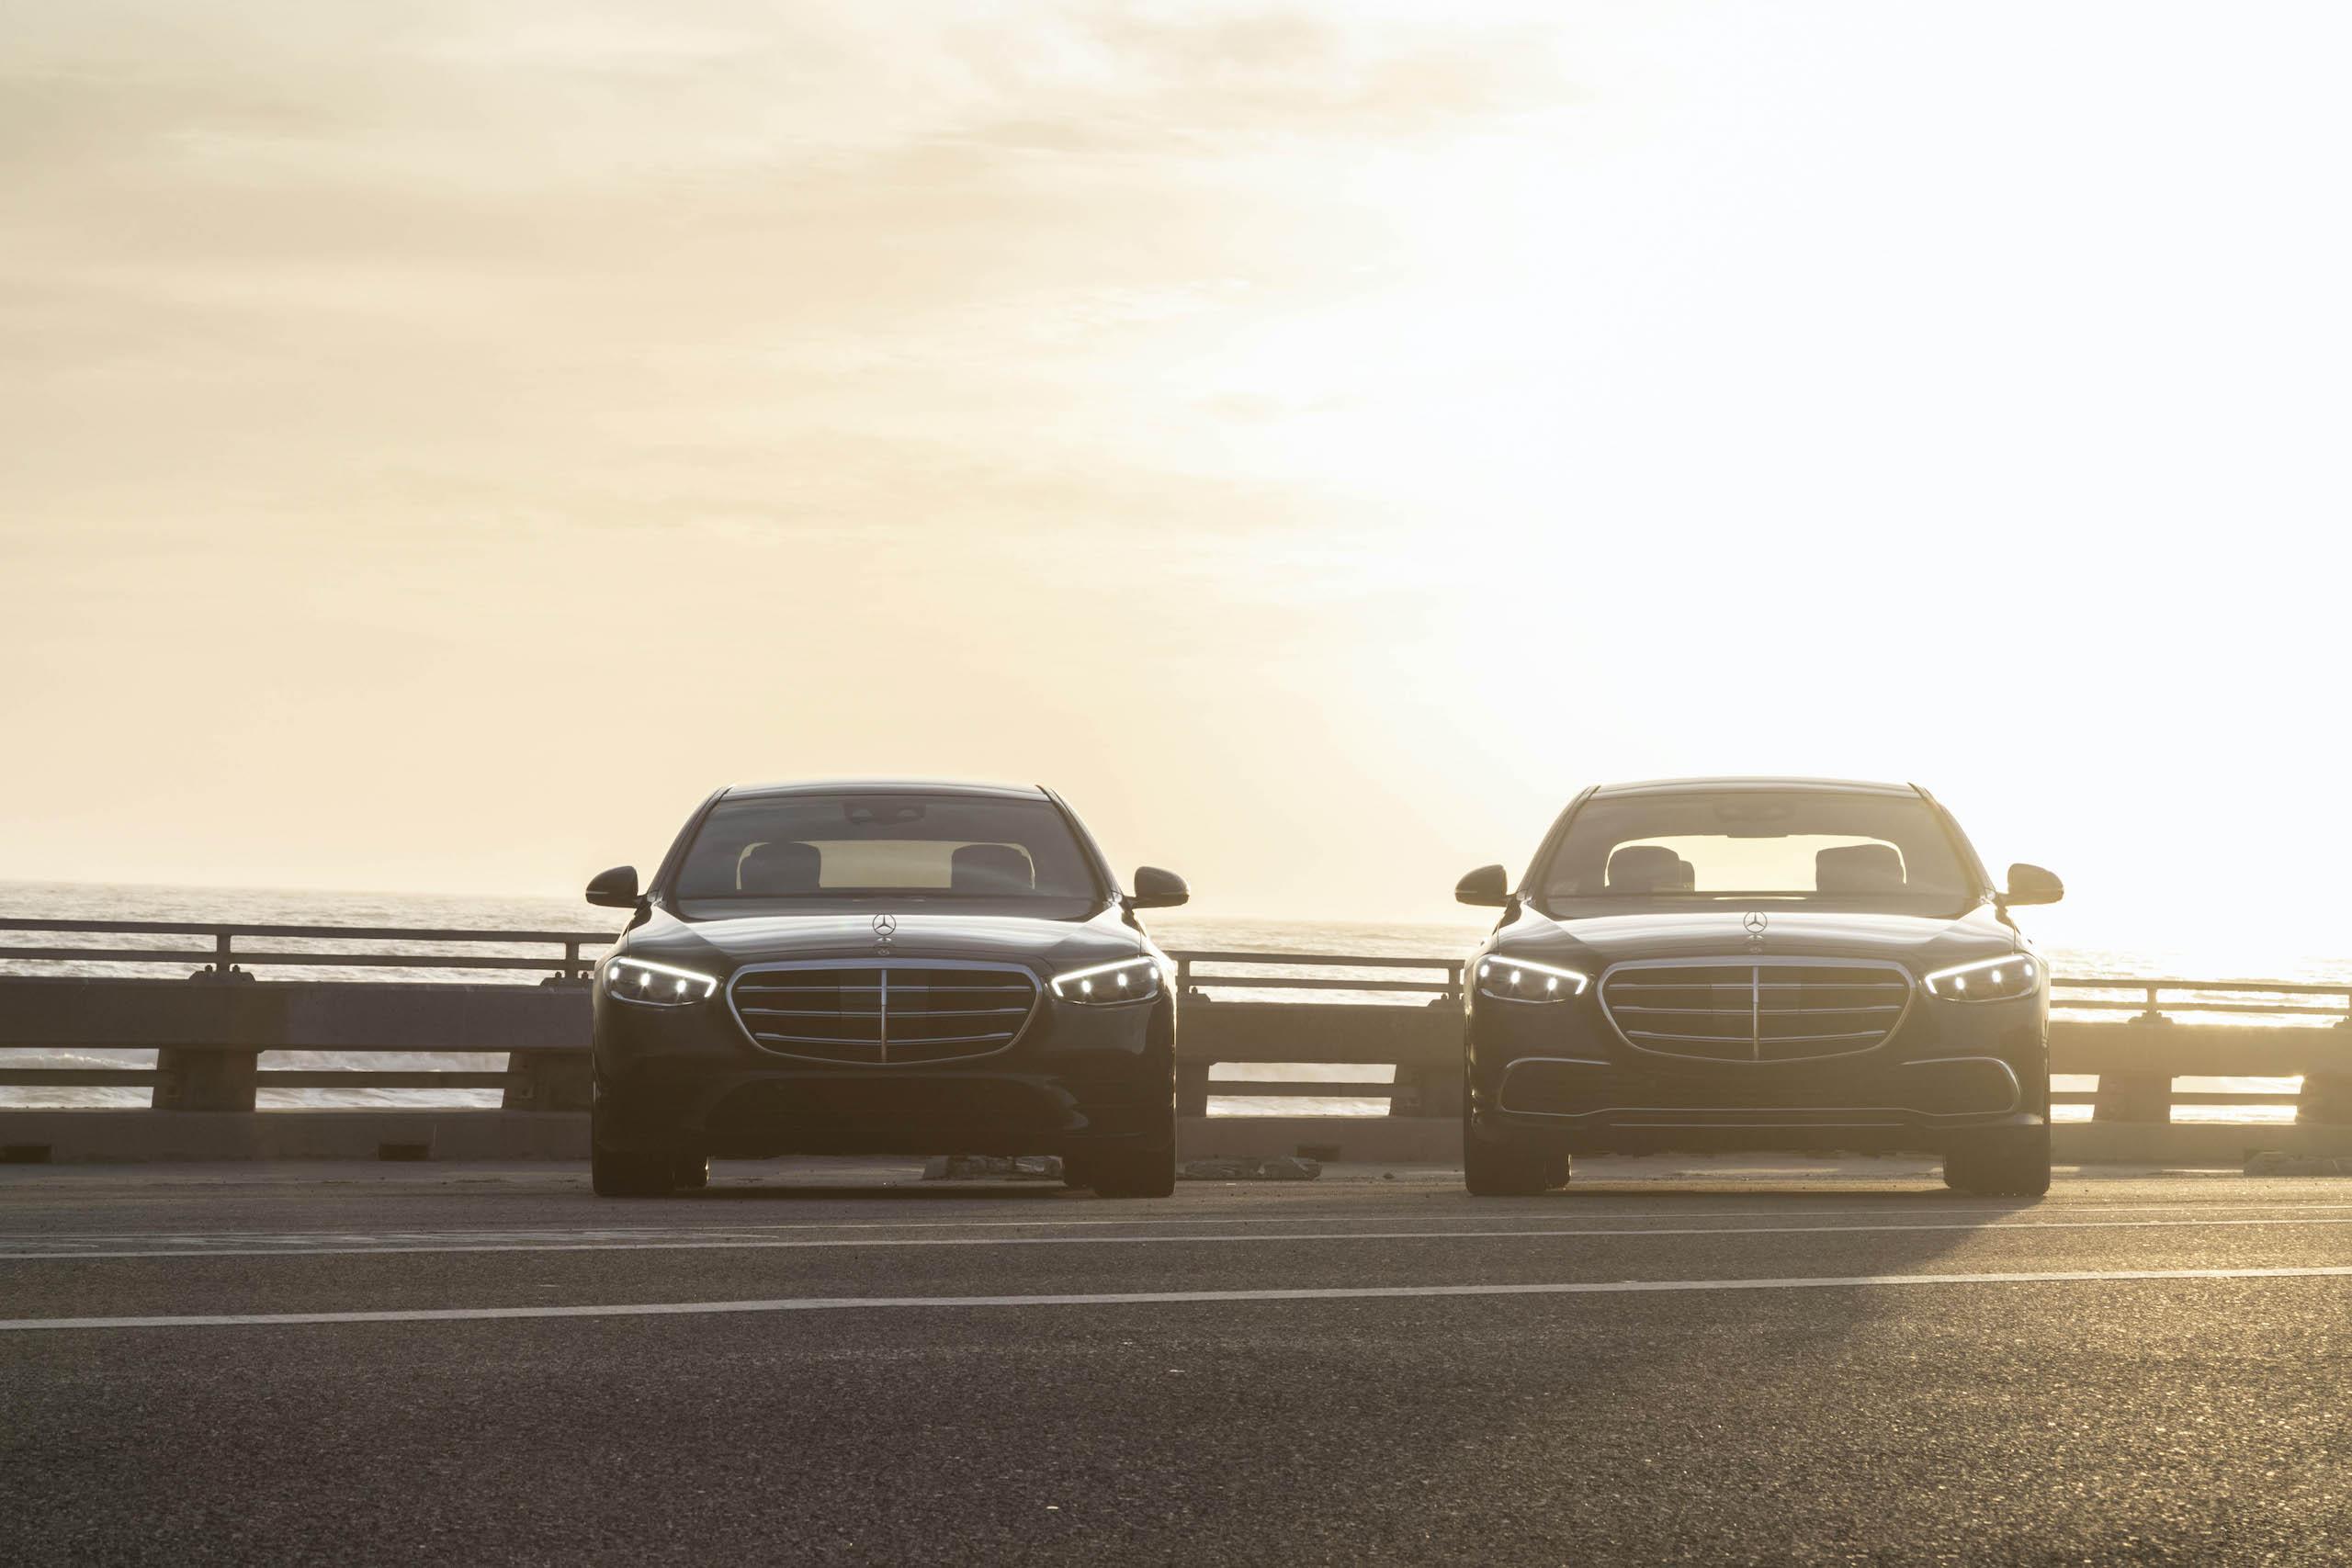 Mercedes Benz-S-Class fronts